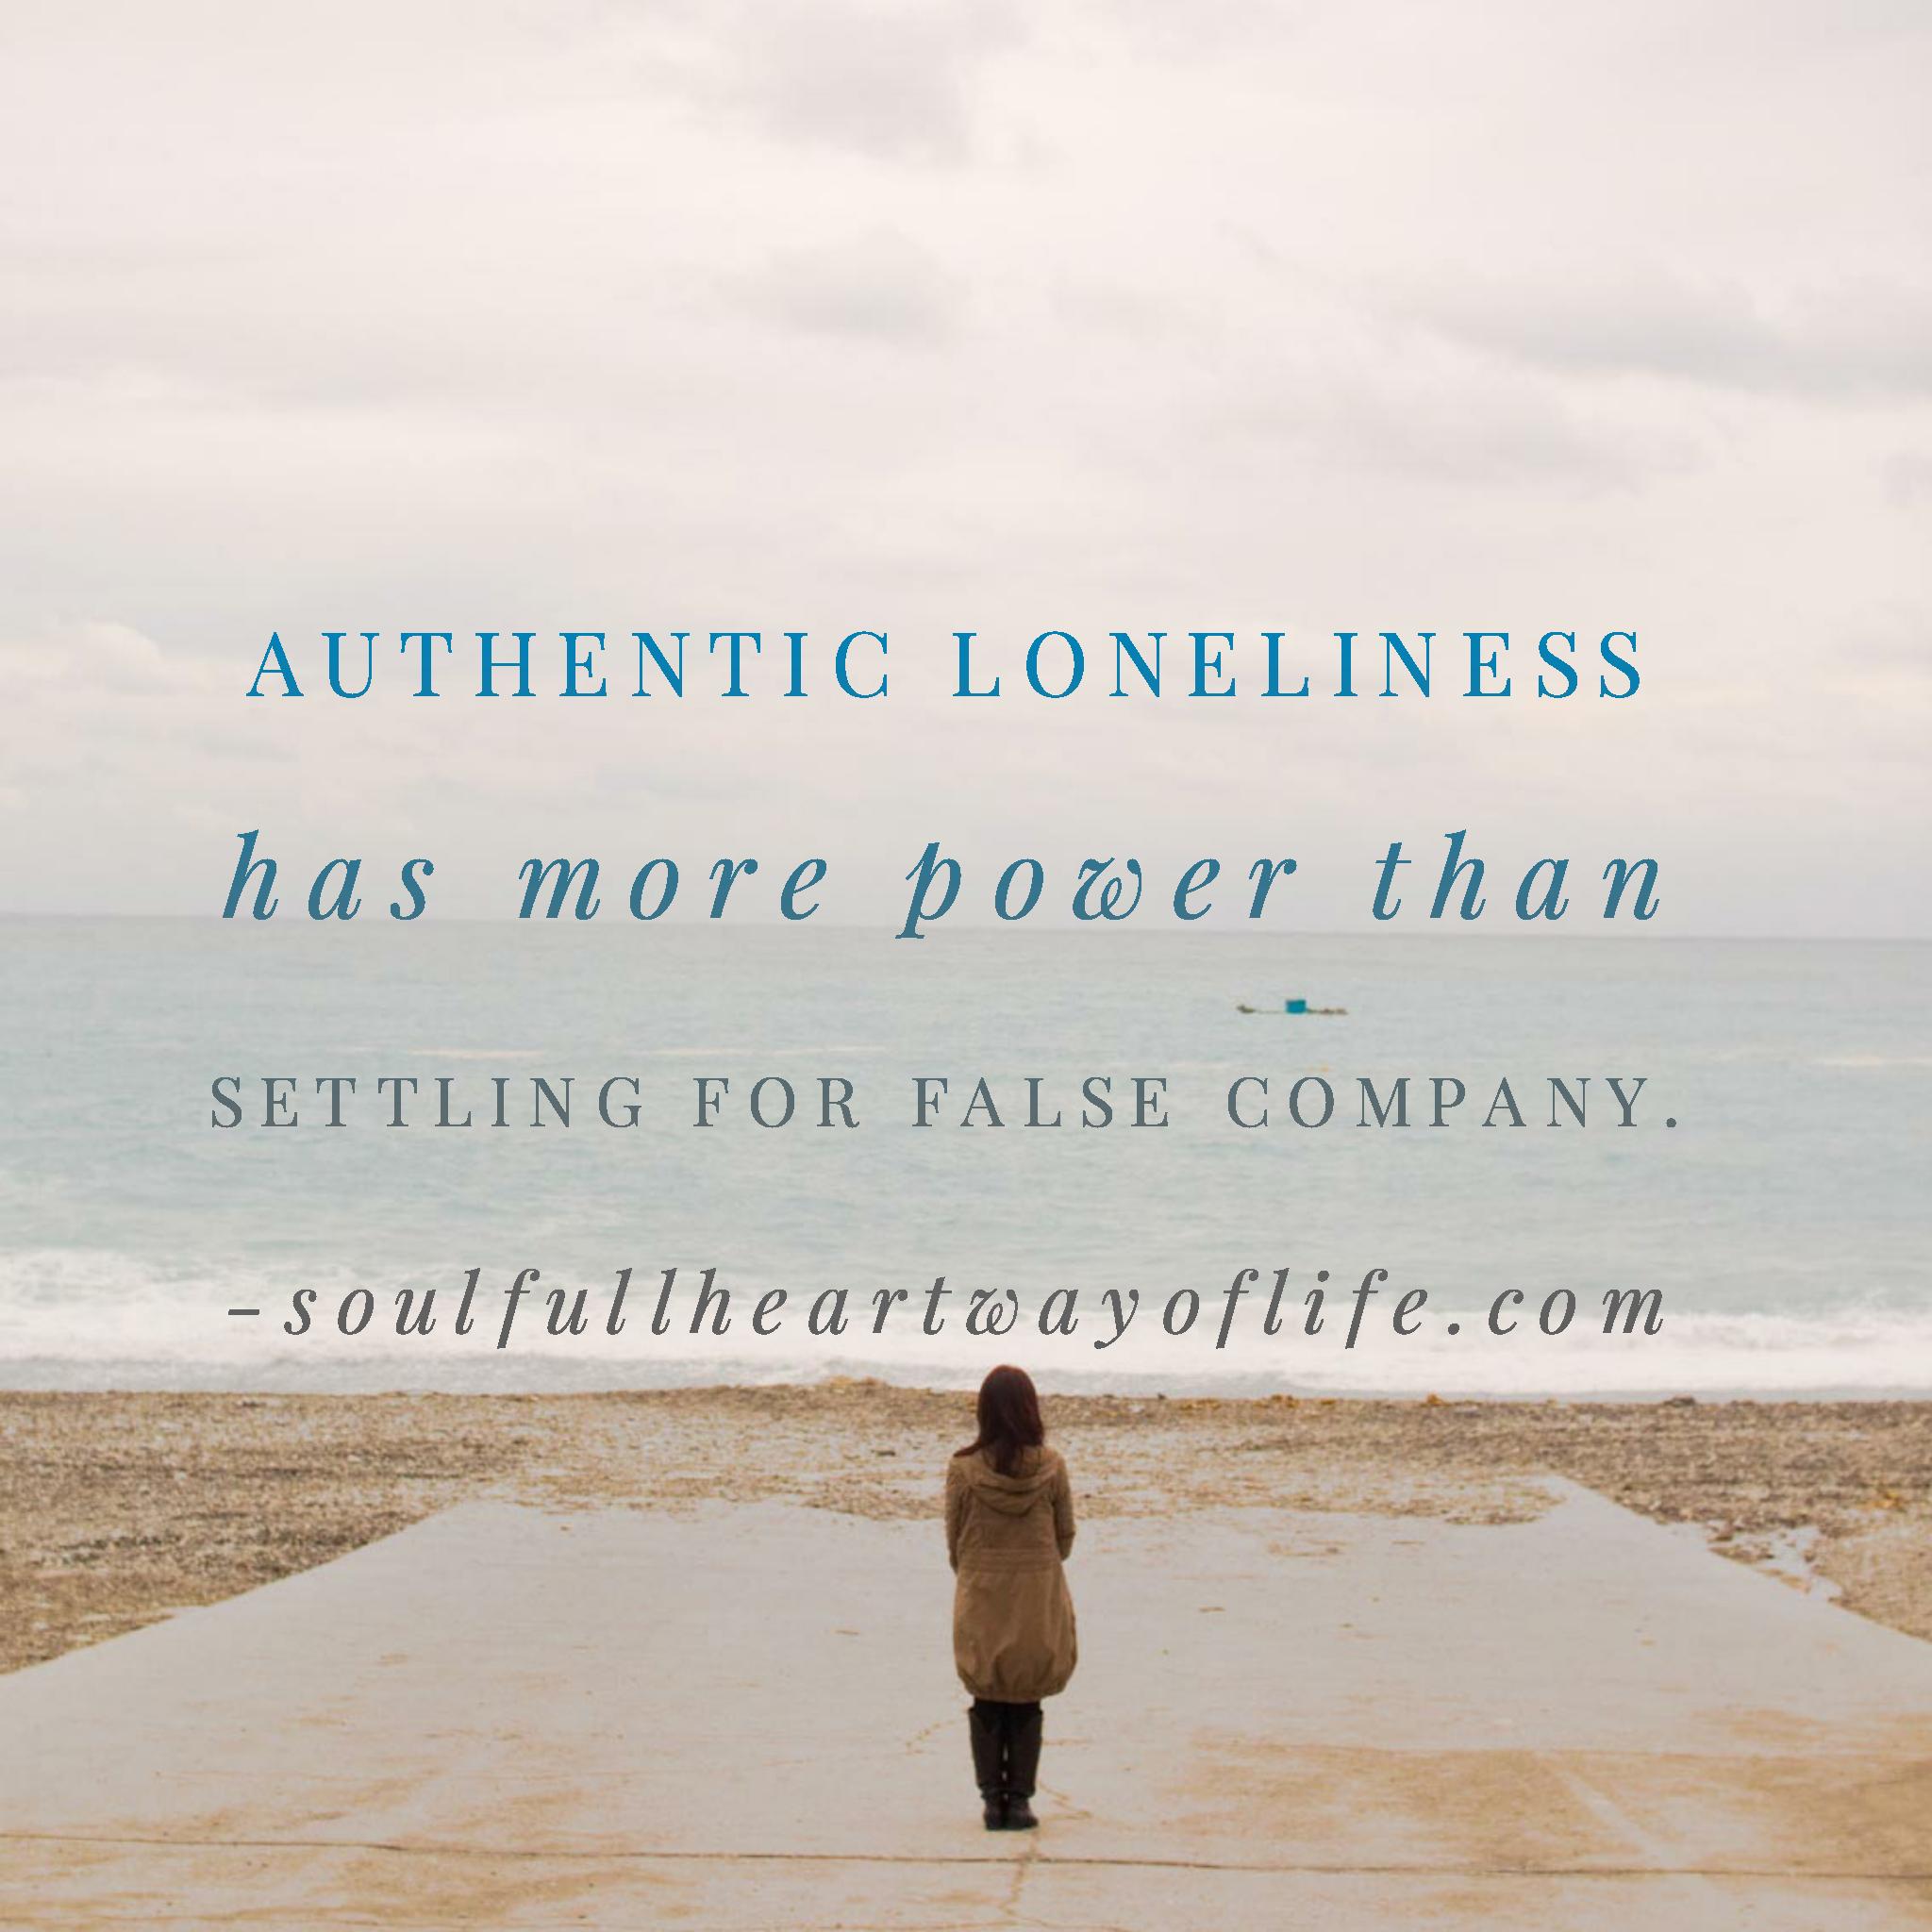 authentic-loneliness